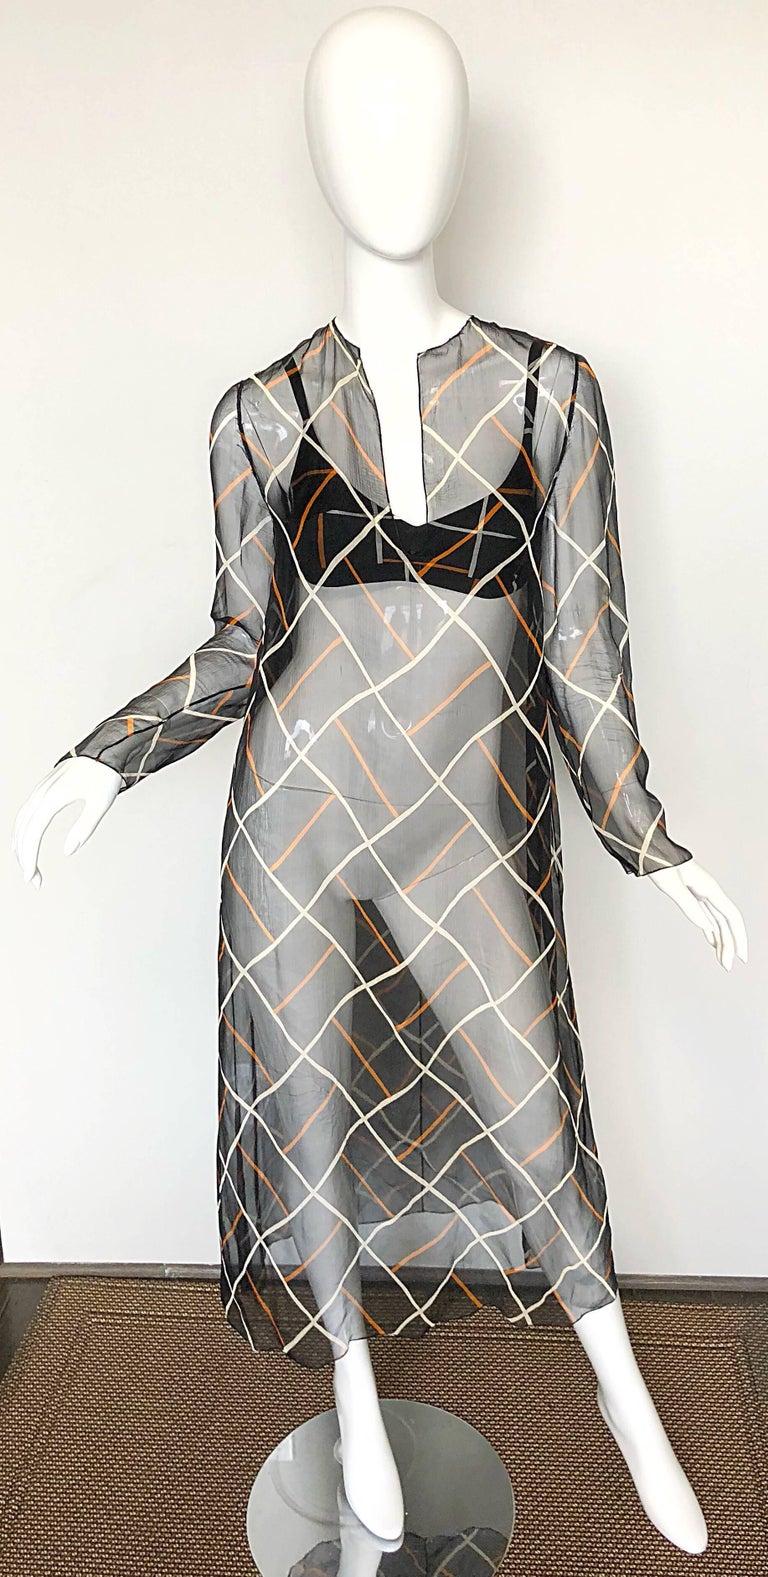 Cardinali 1970s Original Sample Chiffon Bra and Sheer Vintage 70s Tunic Dress For Sale 4